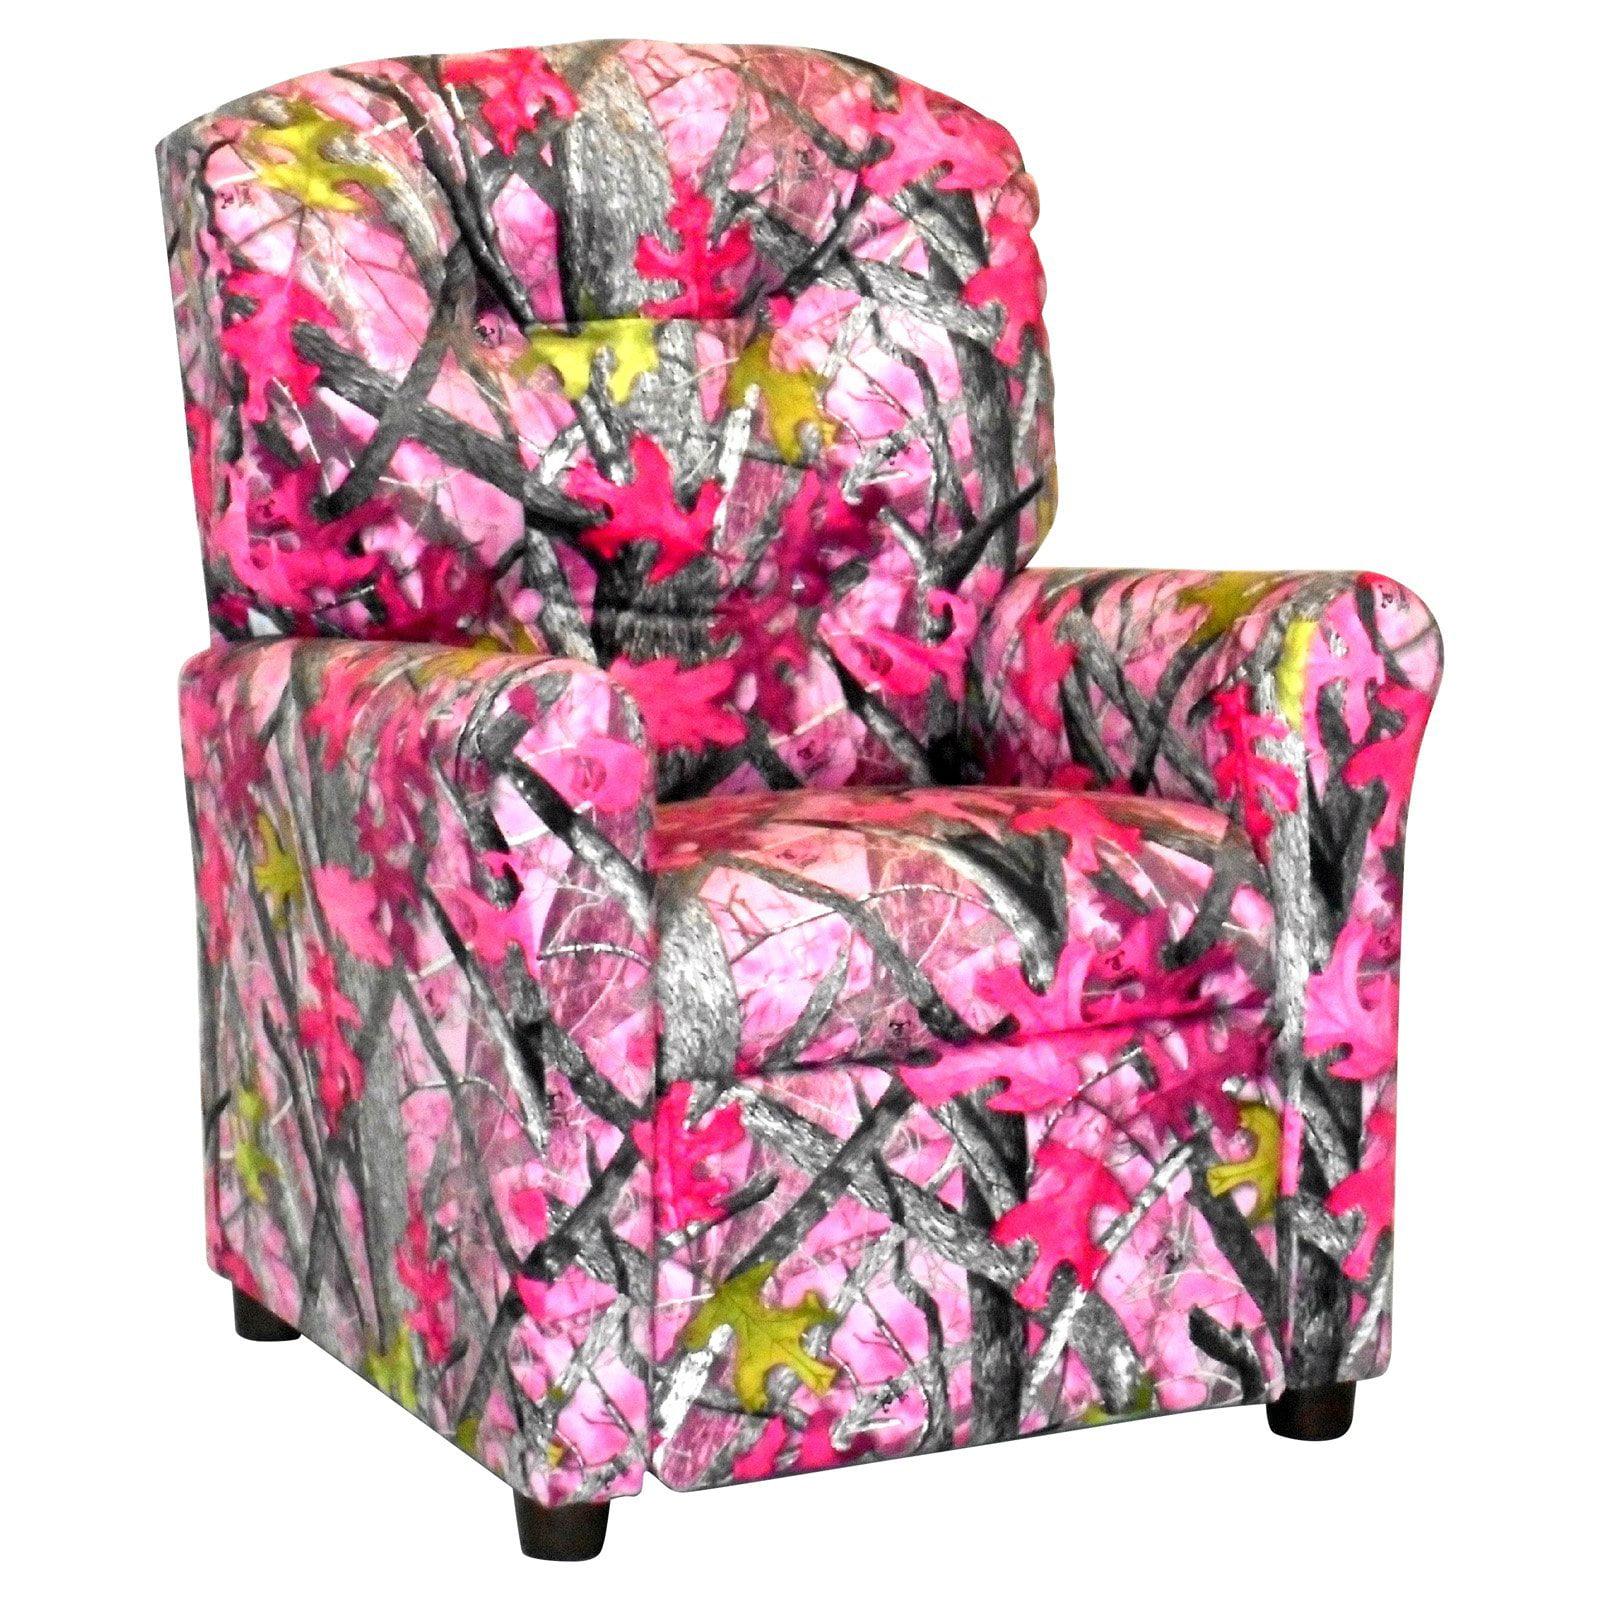 Brazil Furniture 4 Button Back Child Recliner   Sassy Camo Pink    Walmart.com